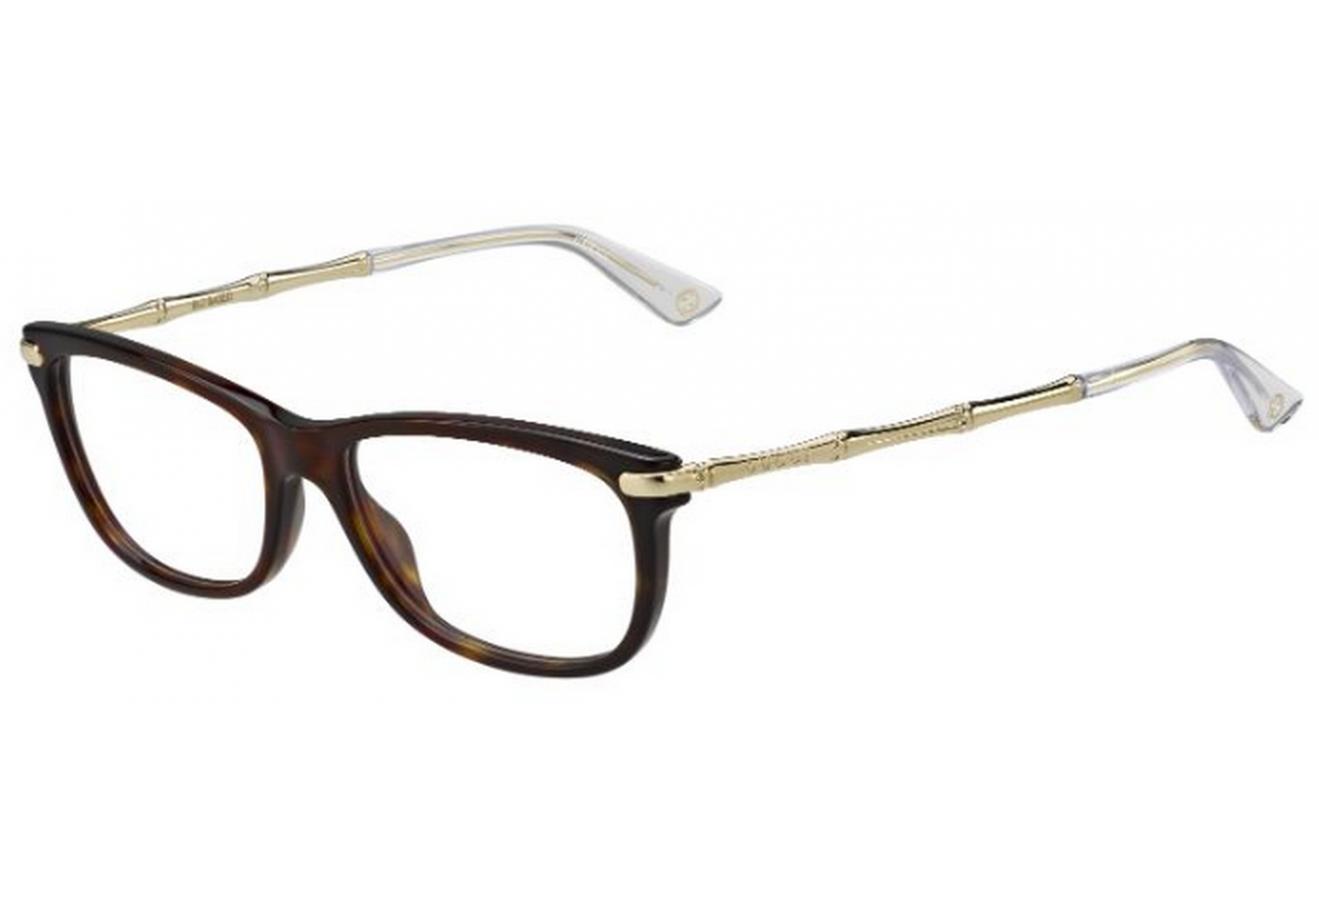 lunettes de vue gucci gg 3779 lvl 53 16. Black Bedroom Furniture Sets. Home Design Ideas